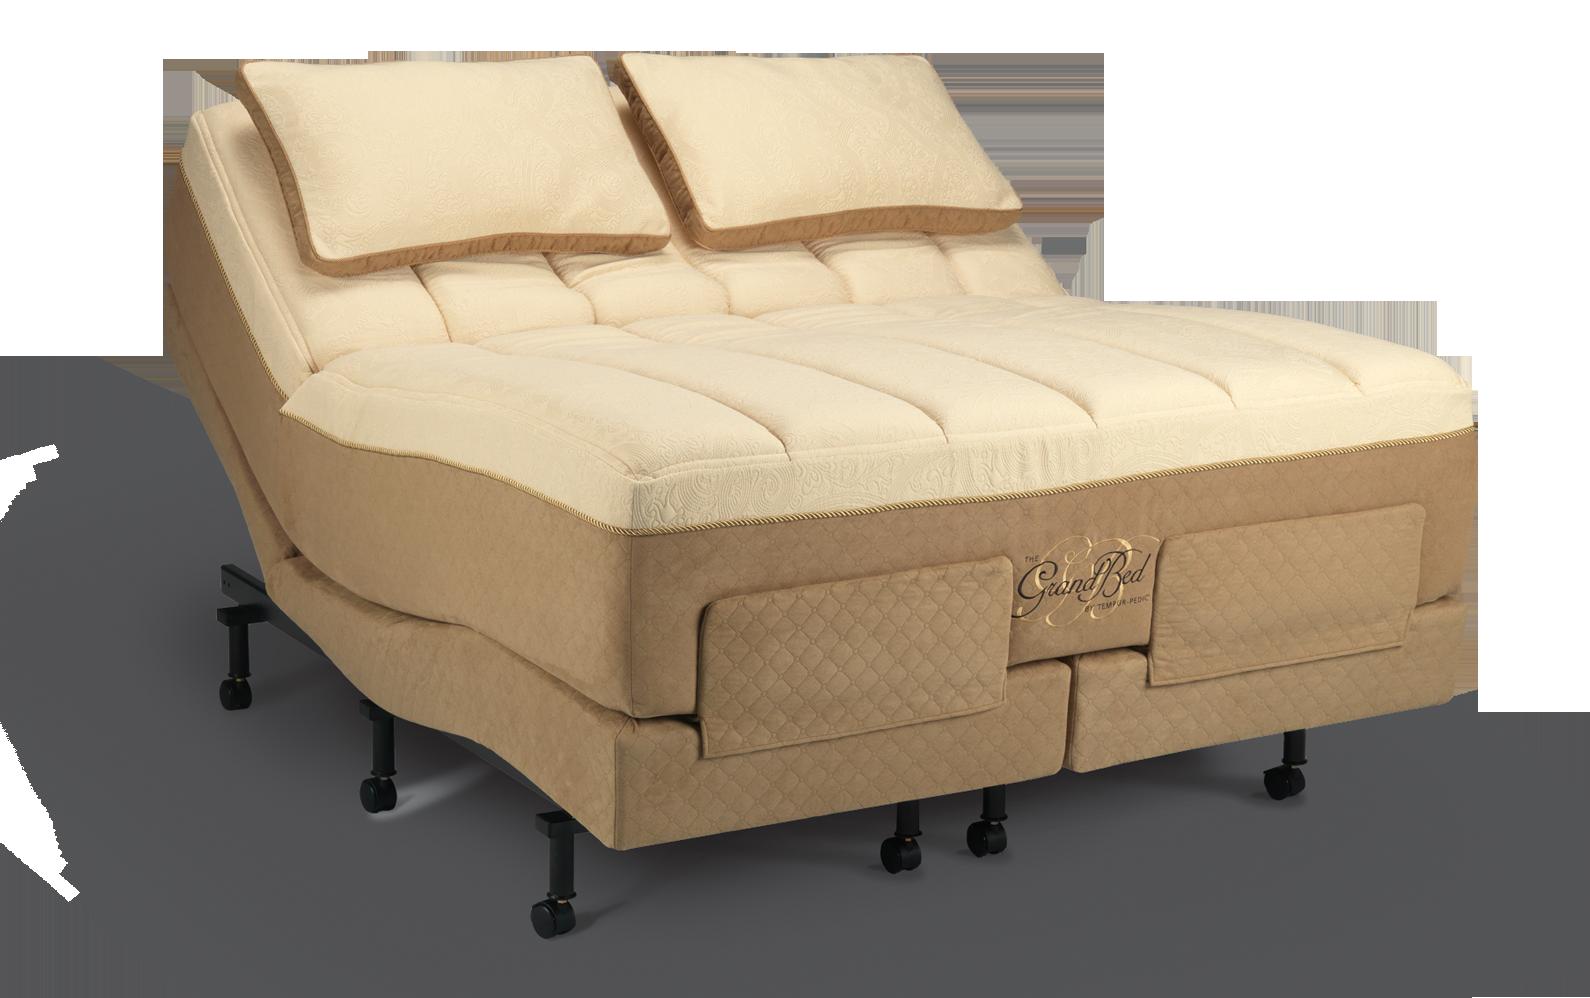 Temperpedic Grand Bed mattress on Advanced Ergo adjustable